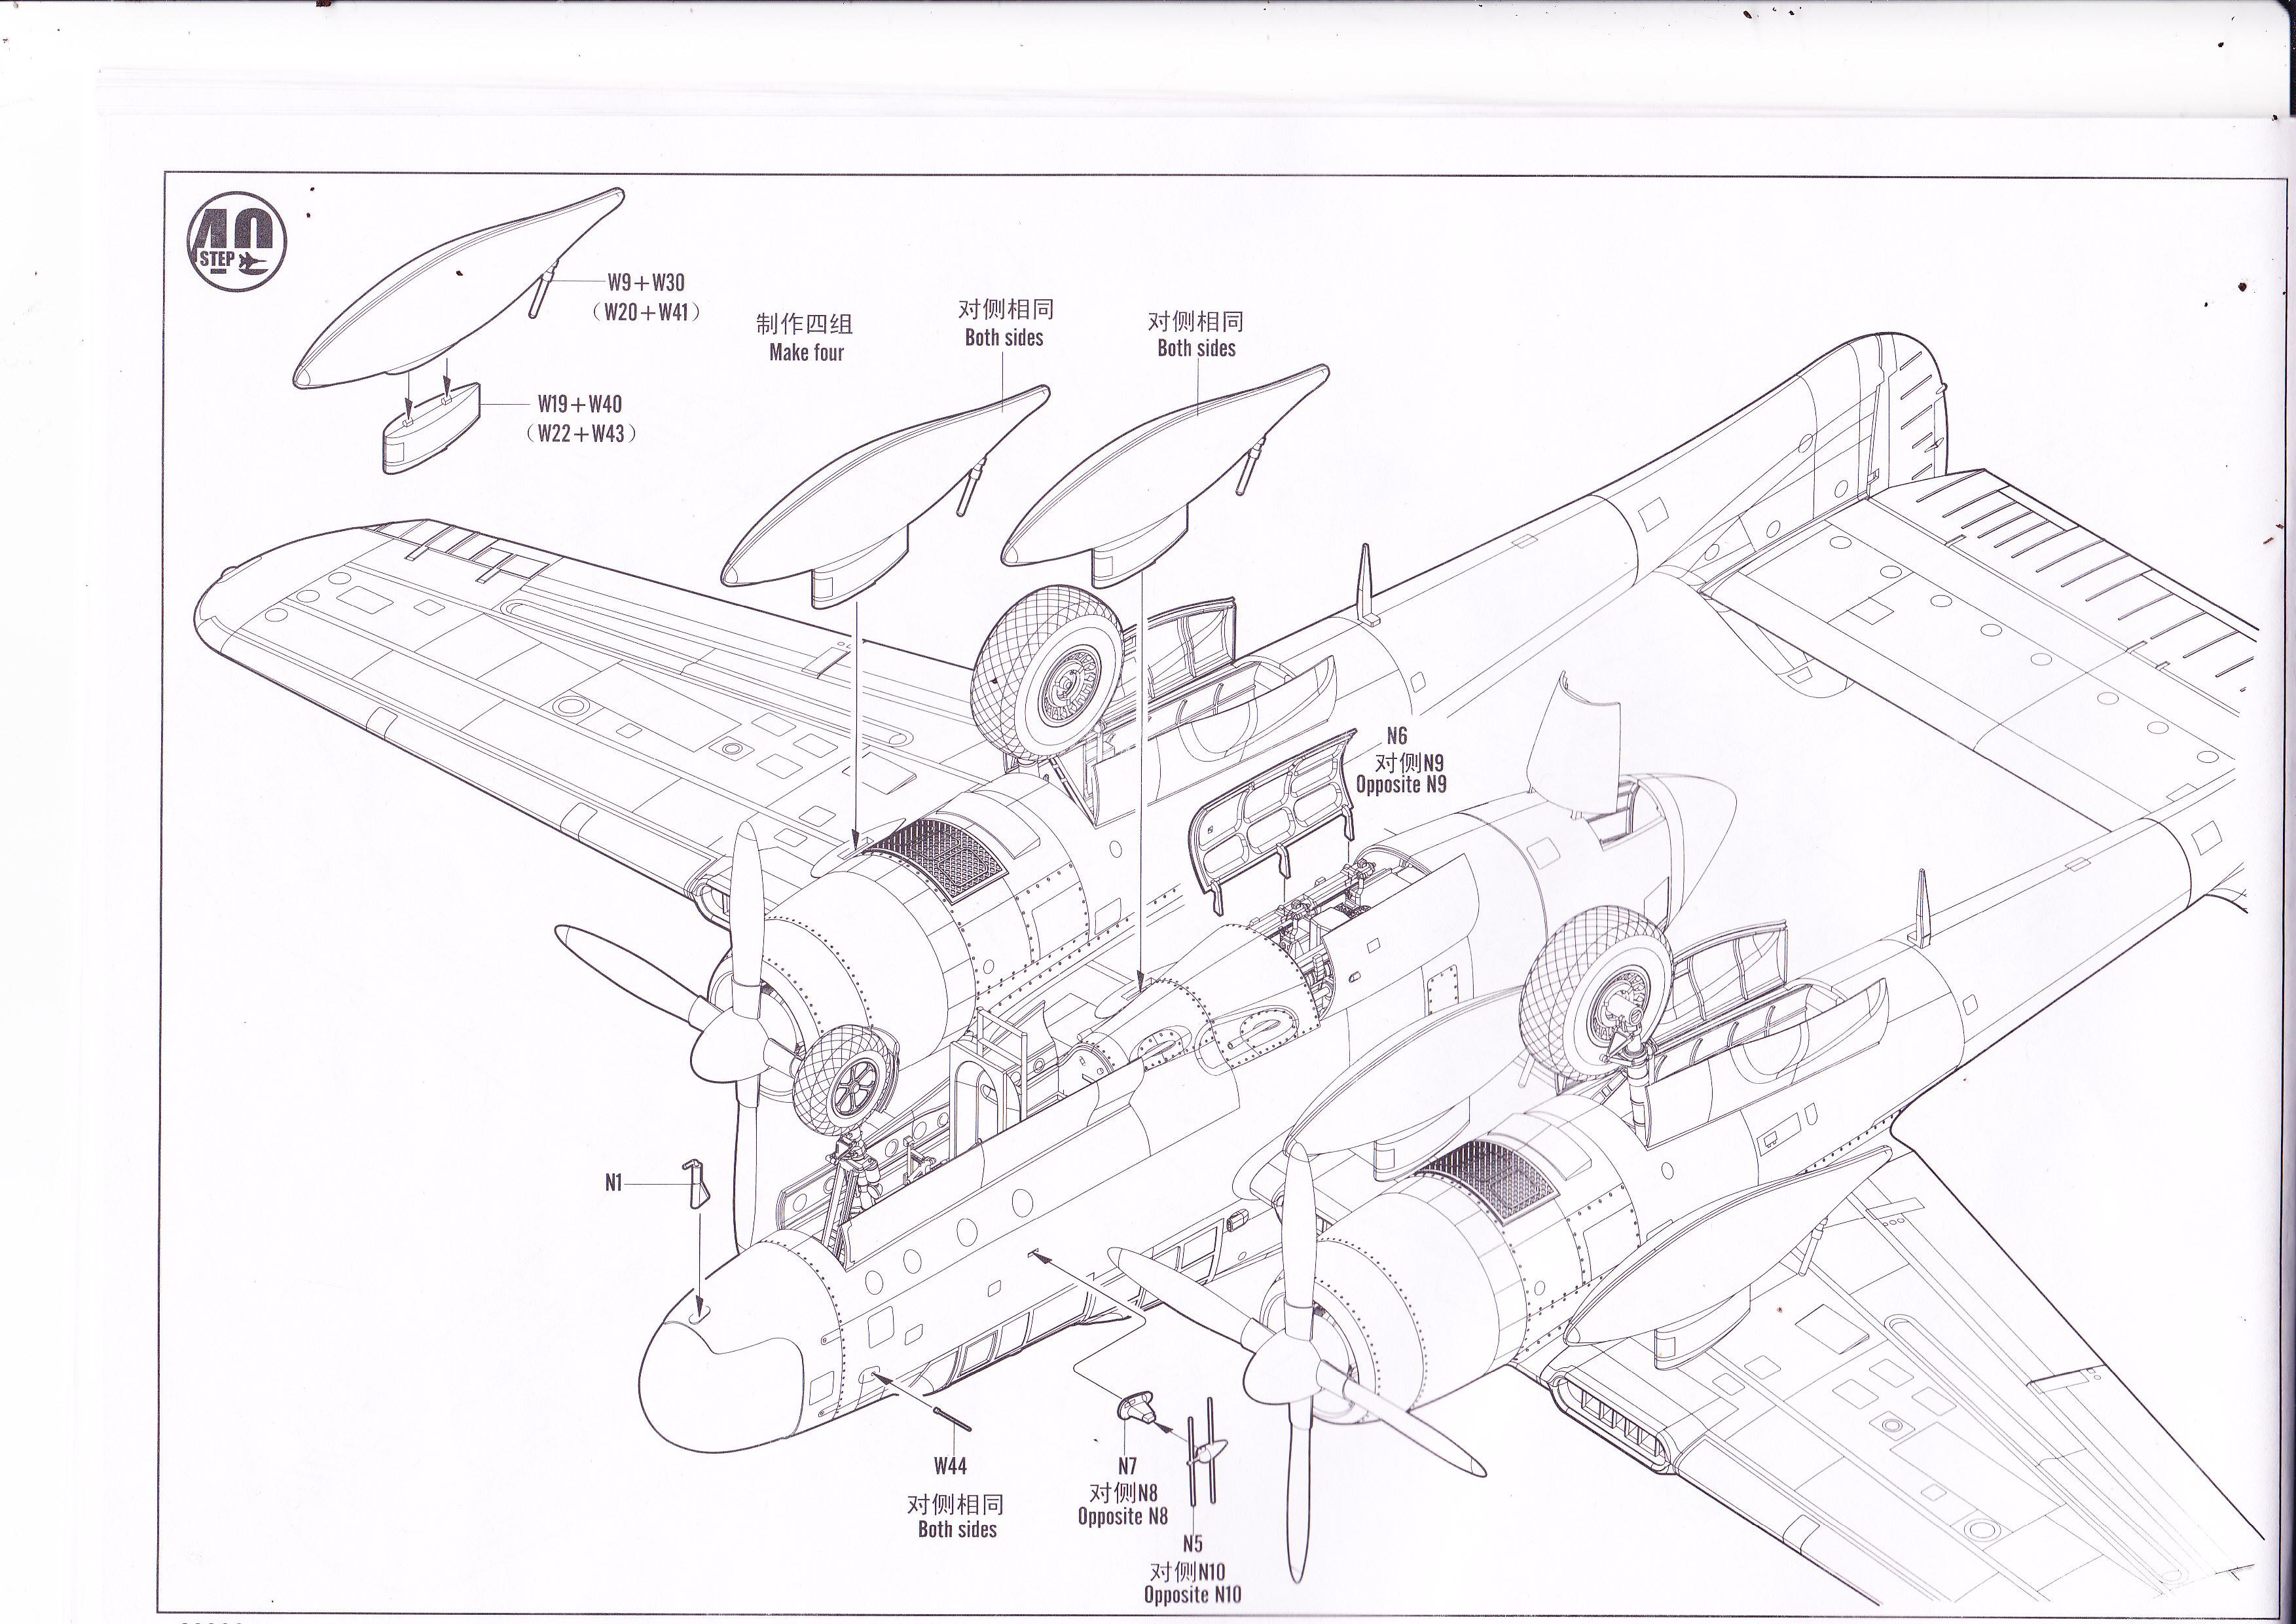 P-61 B Black Widow Hobby Boss Img0027zl